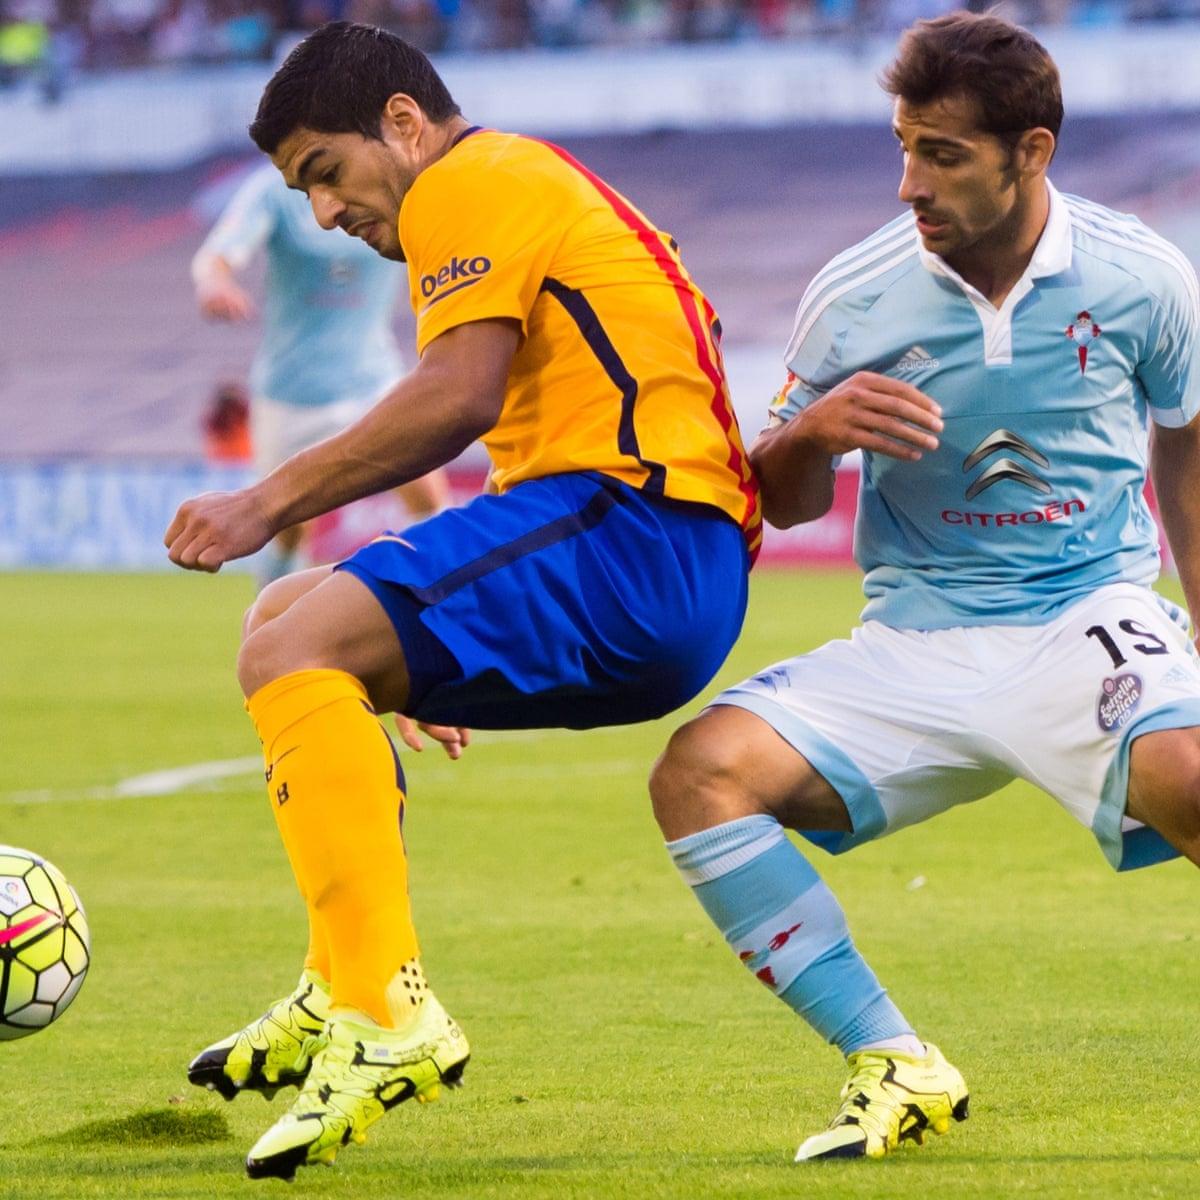 Celta Vigo 4 1 Barcelona La Liga As It Happened Football